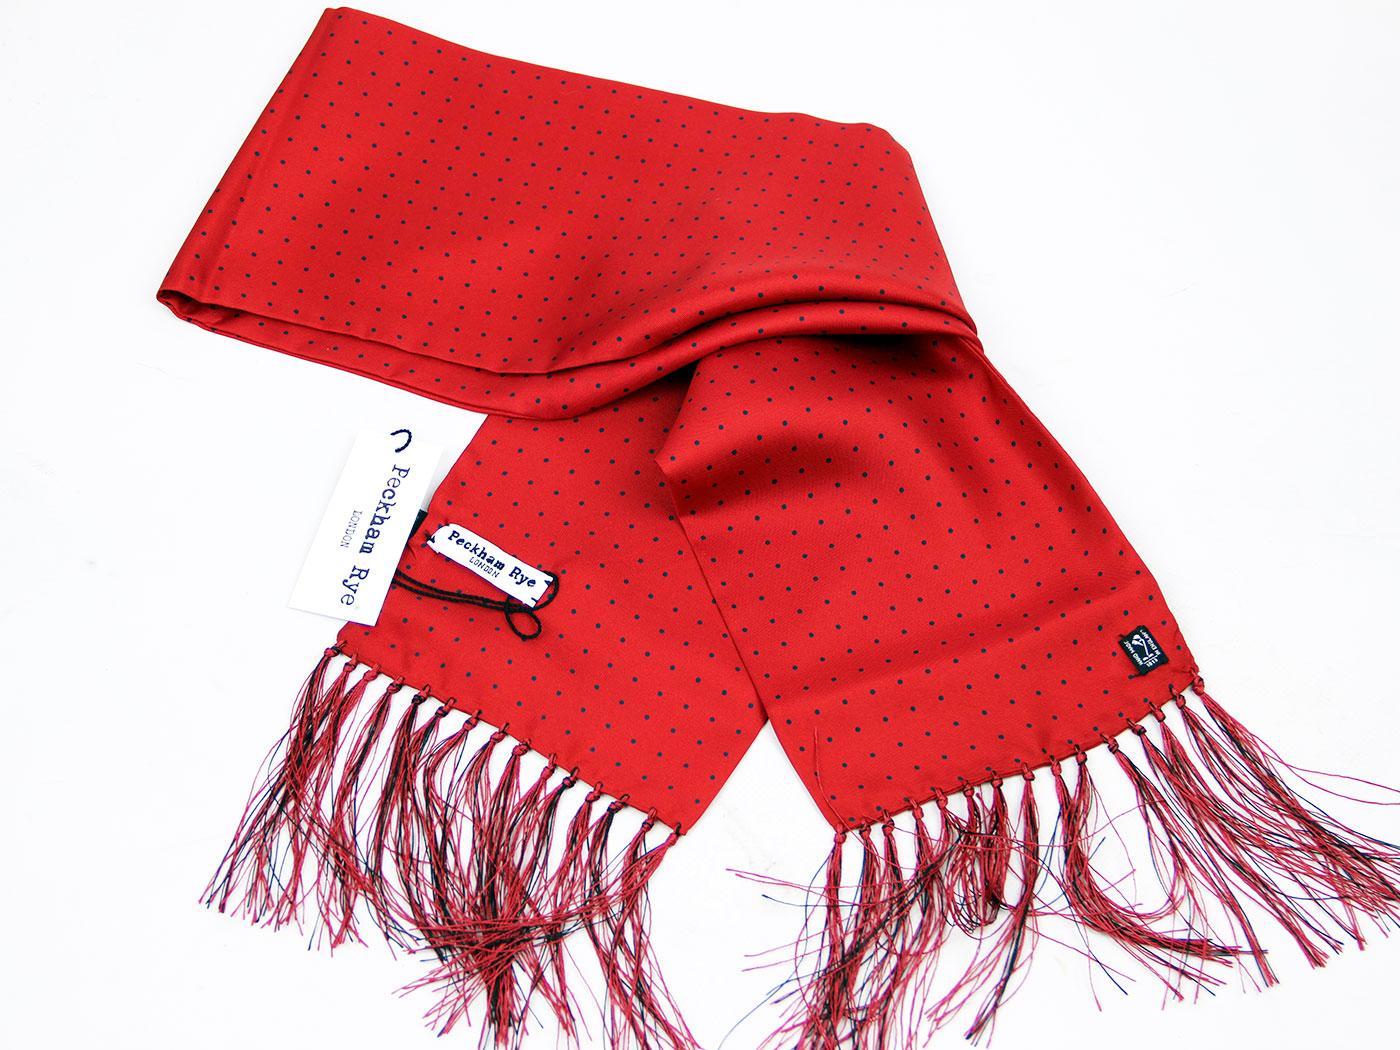 peckham rye spot retro 60s mod silk scarf